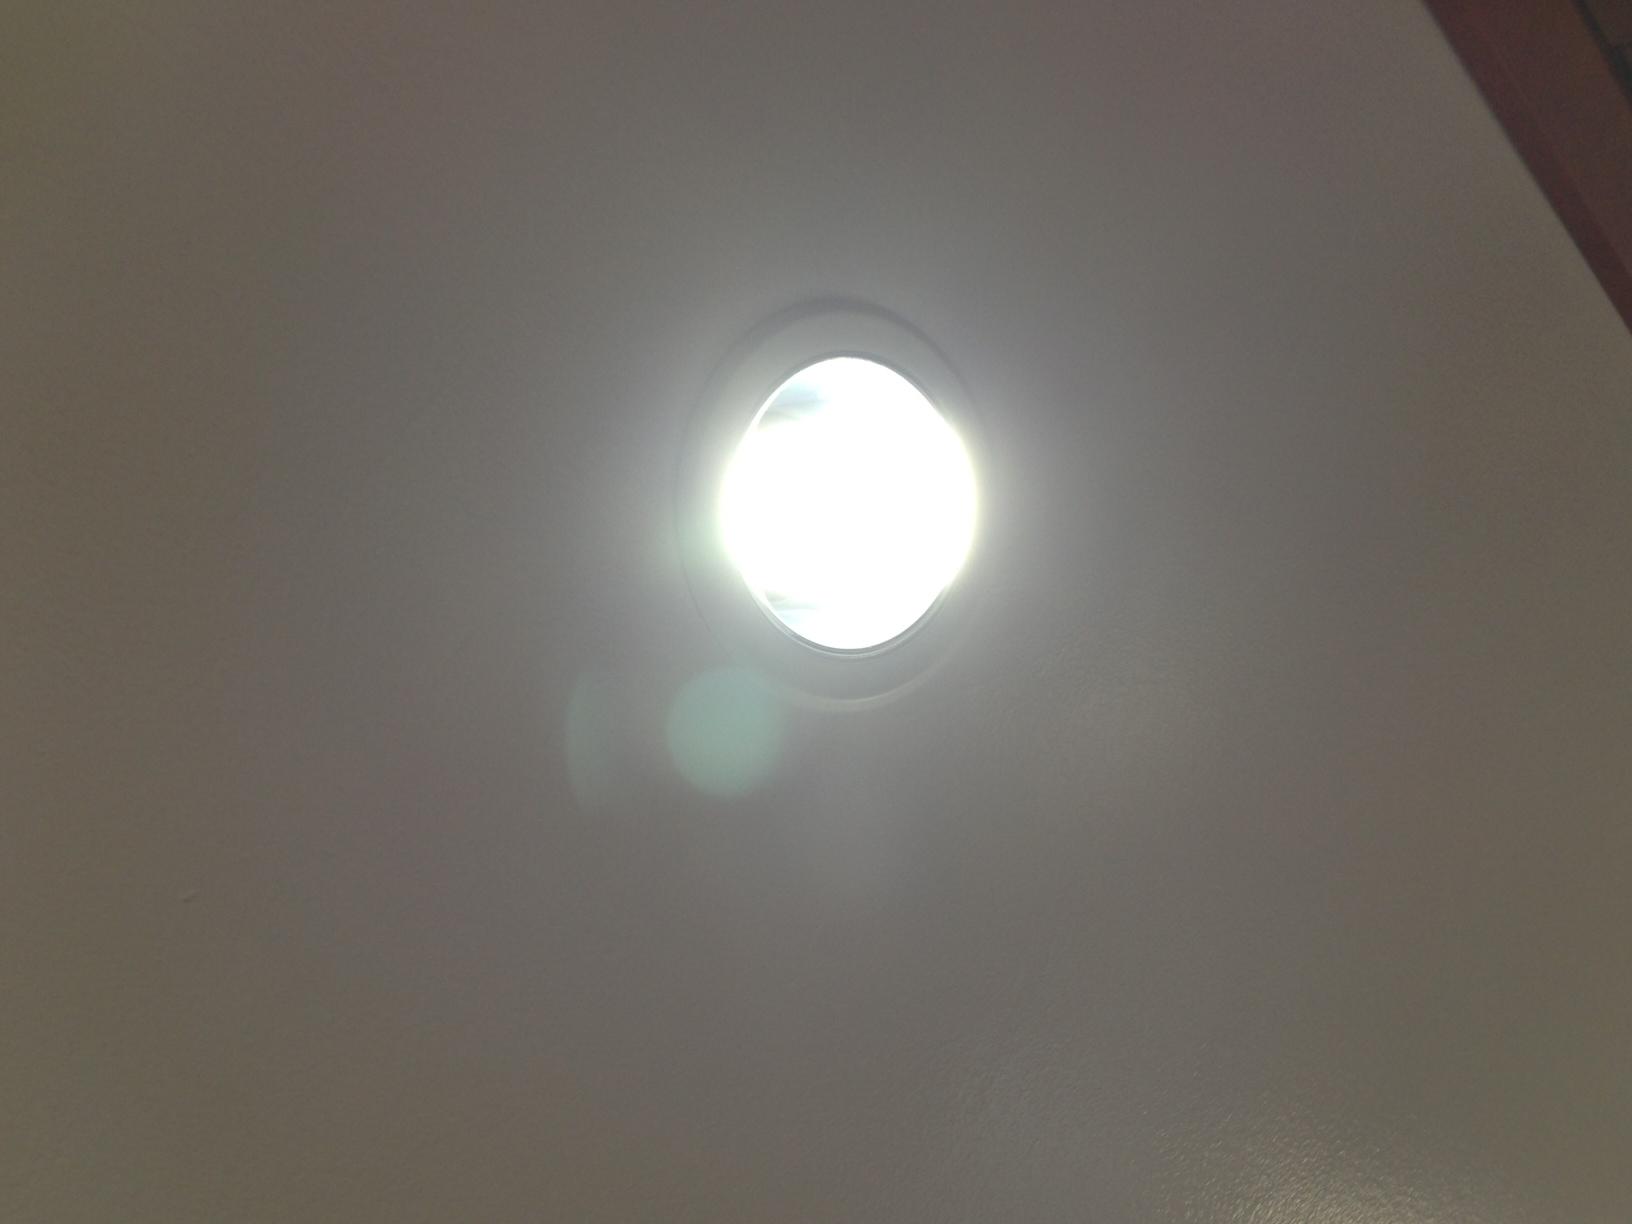 3w globe led light bulb white color e27 medium screw base household flat chip ebay. Black Bedroom Furniture Sets. Home Design Ideas